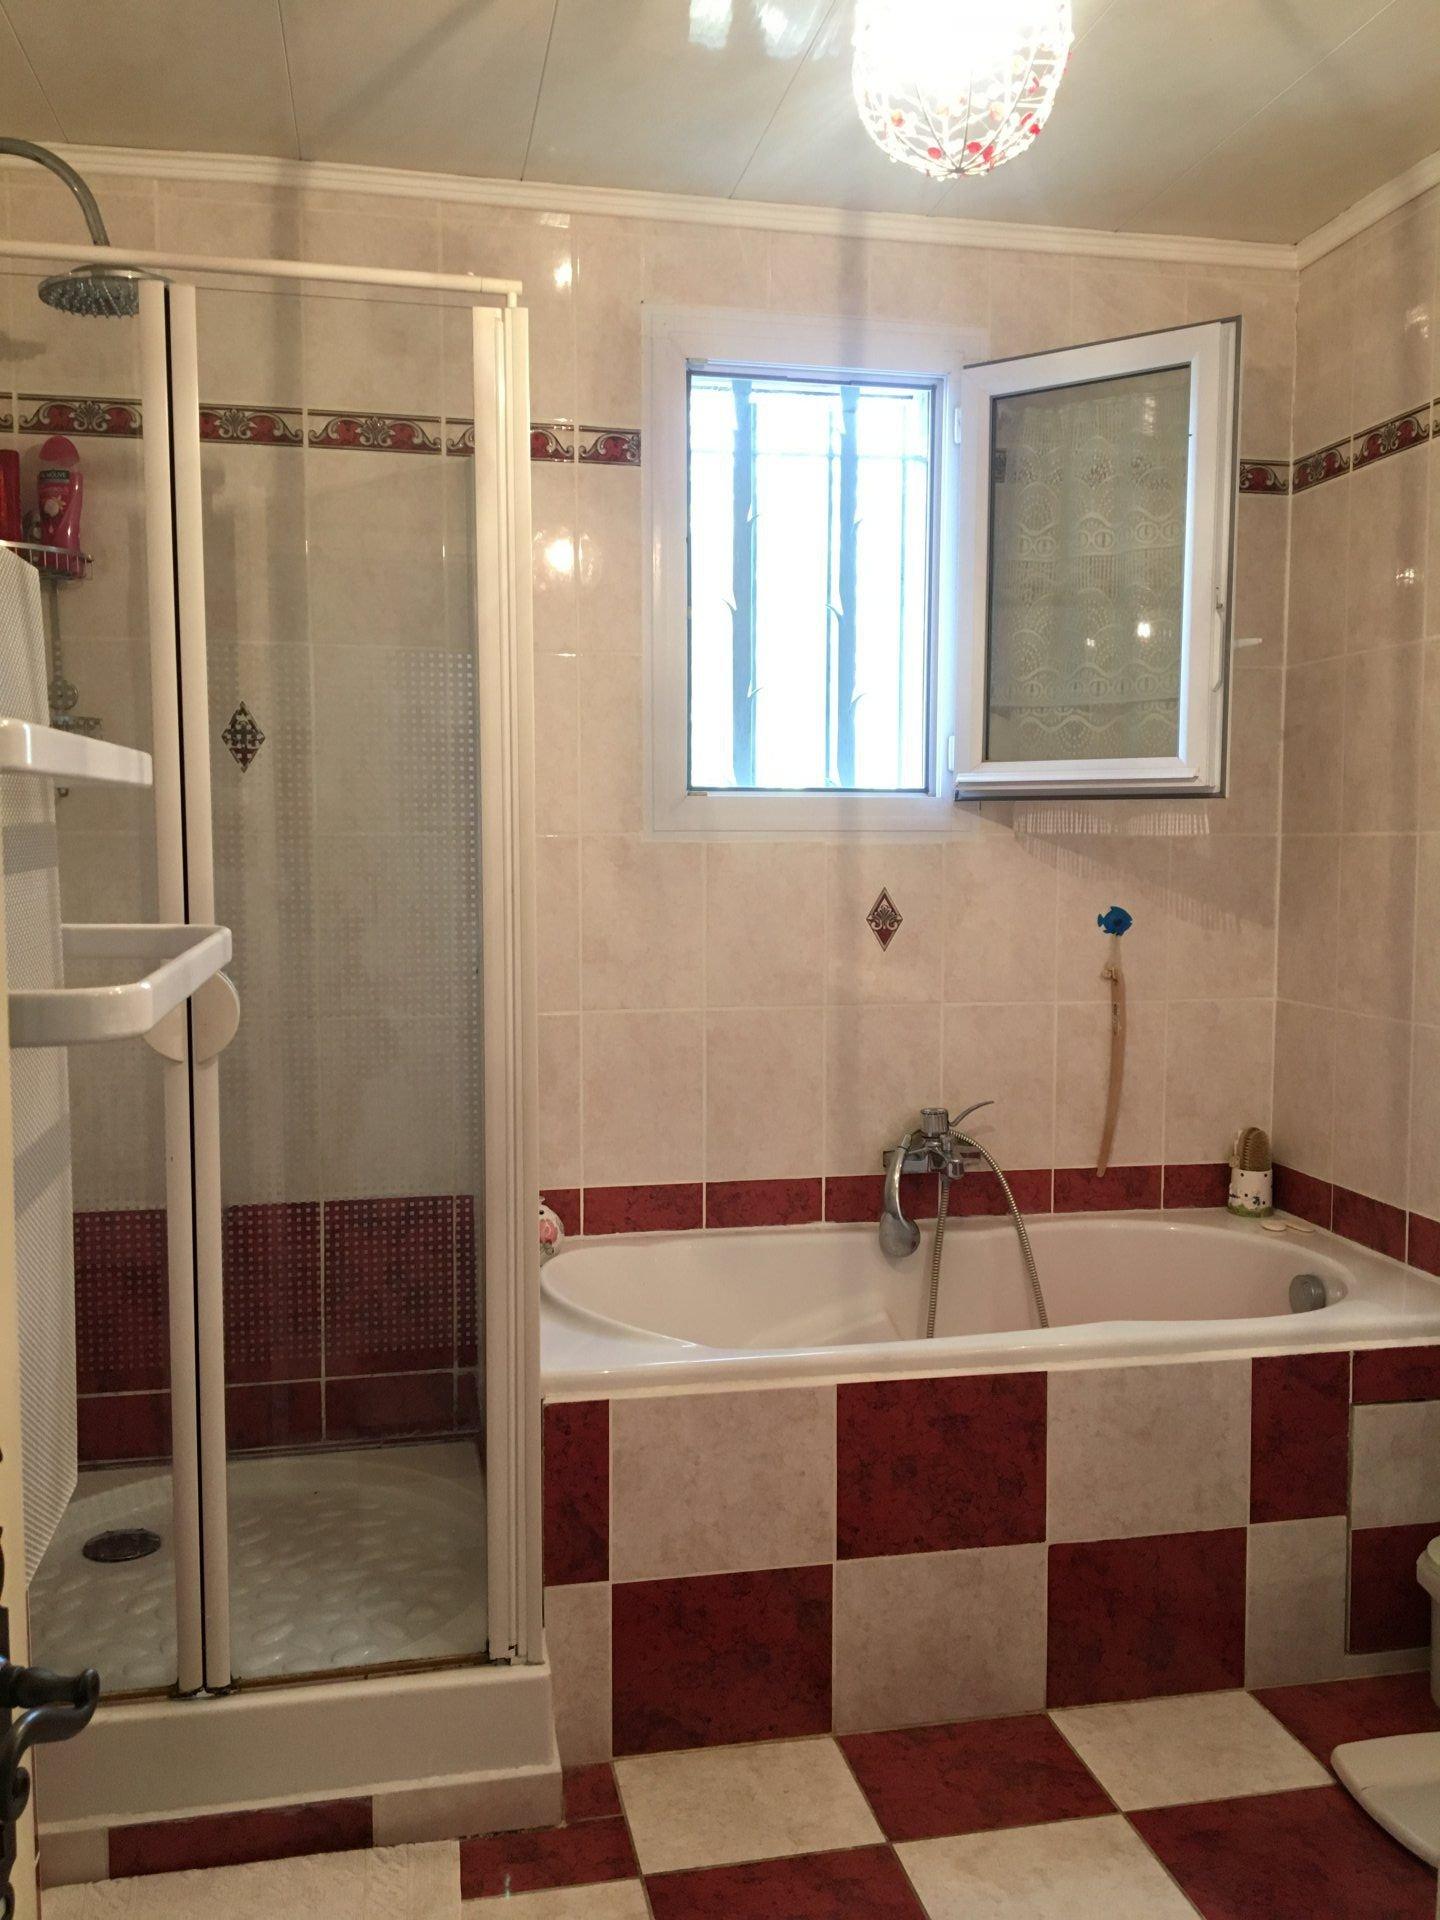 COTIGNAC Villa 135m² + appartement indépendant + studio. Jardin paysagée, piscine.